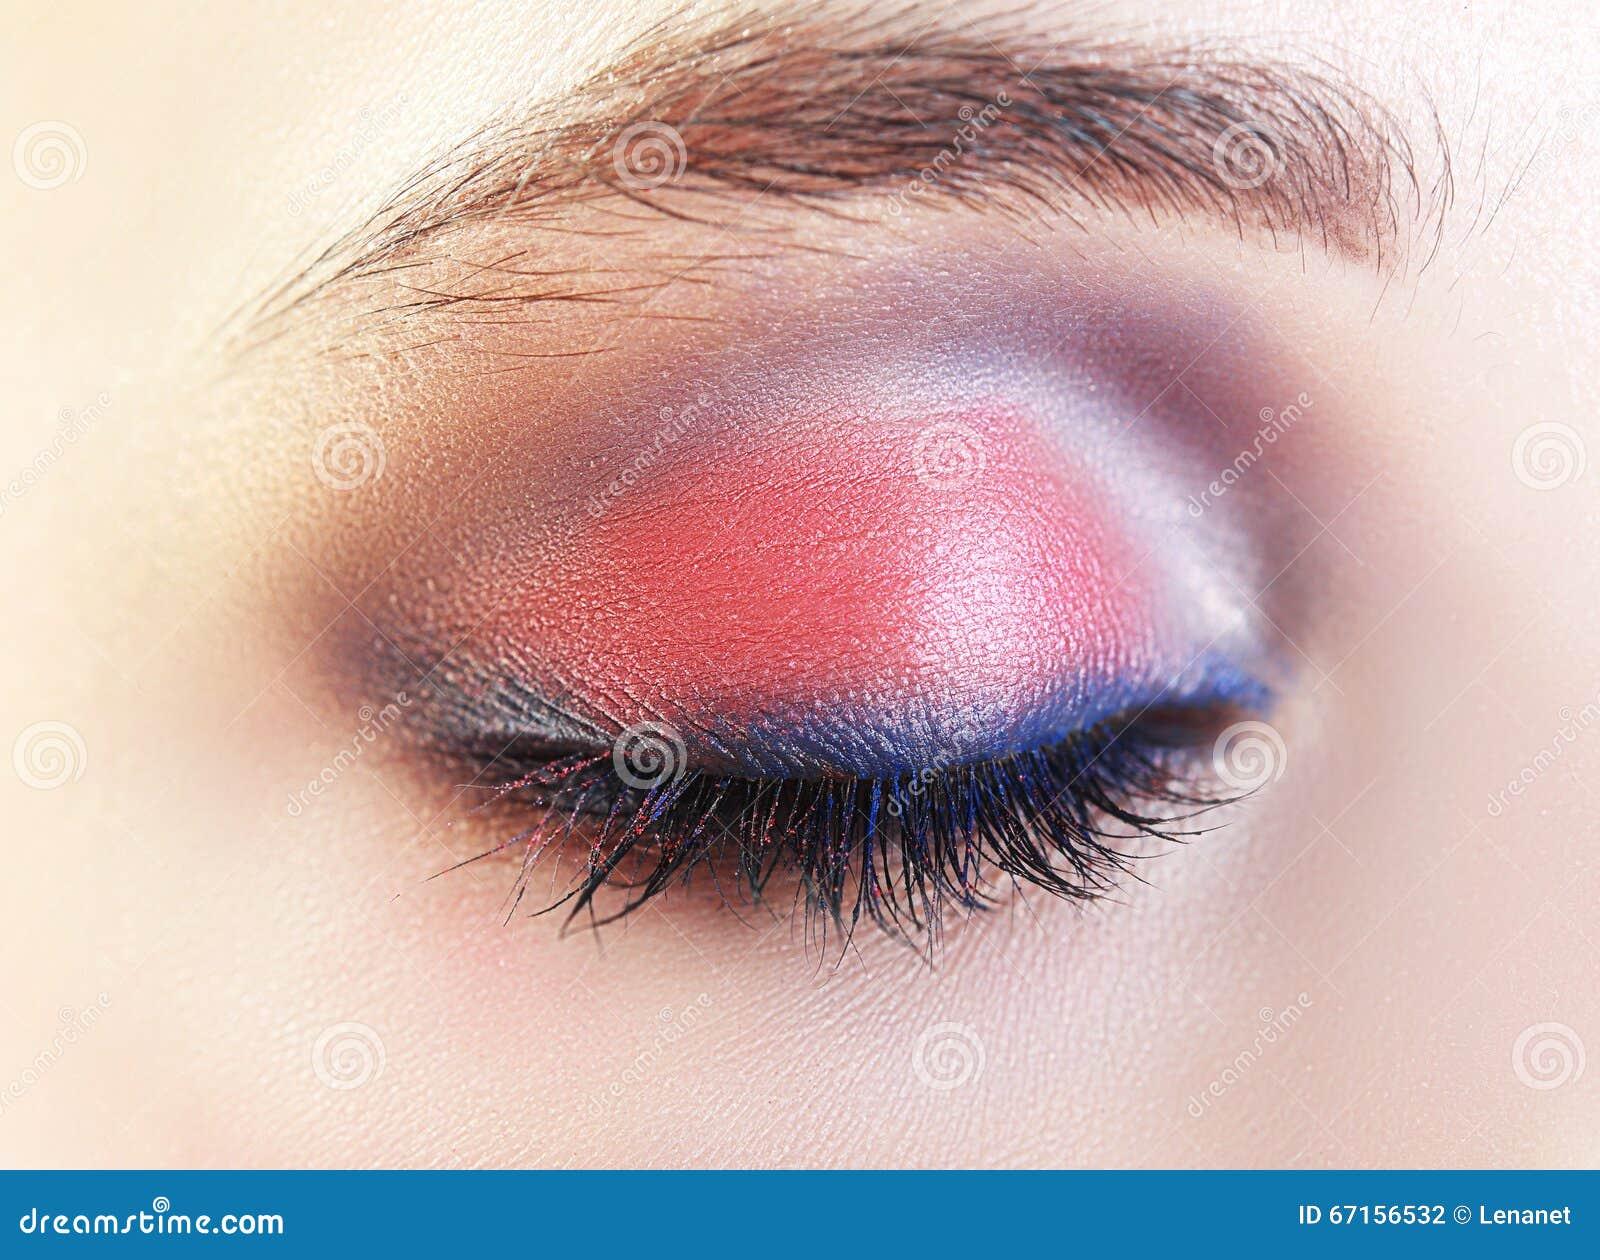 closed eye makeup stock photo image 67156532